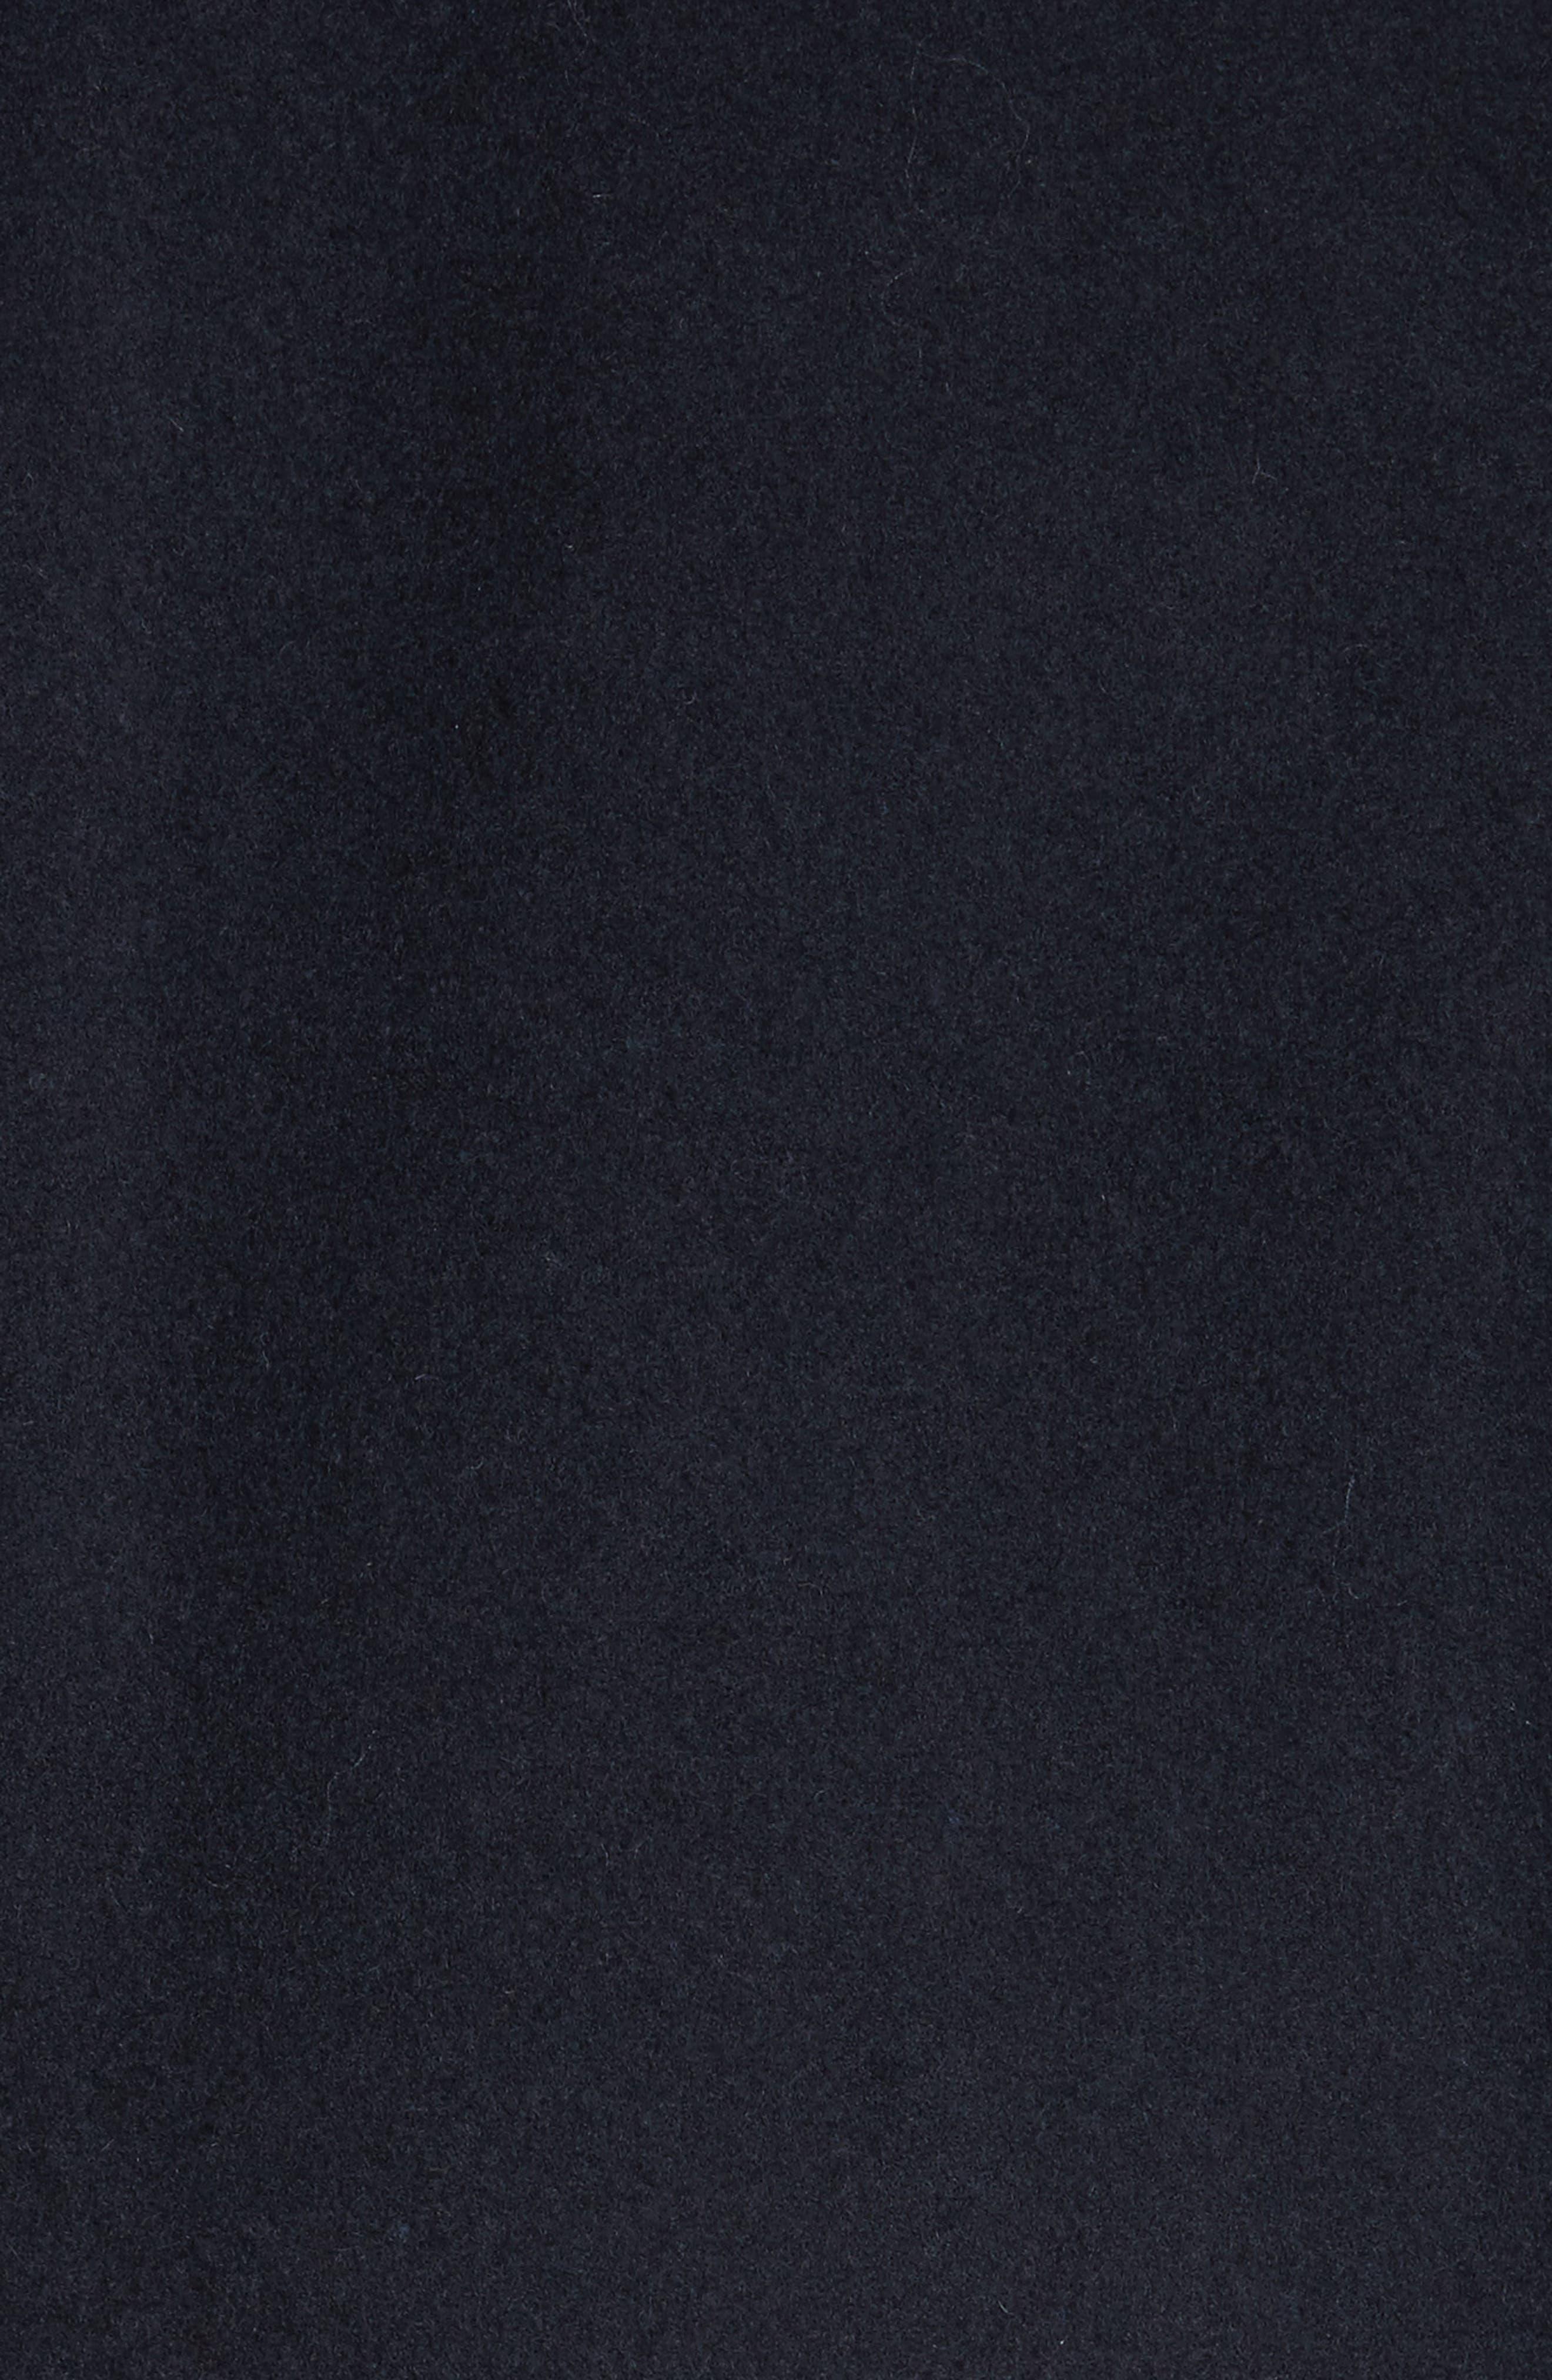 Hook Wool Blend Topcoat,                             Alternate thumbnail 5, color,